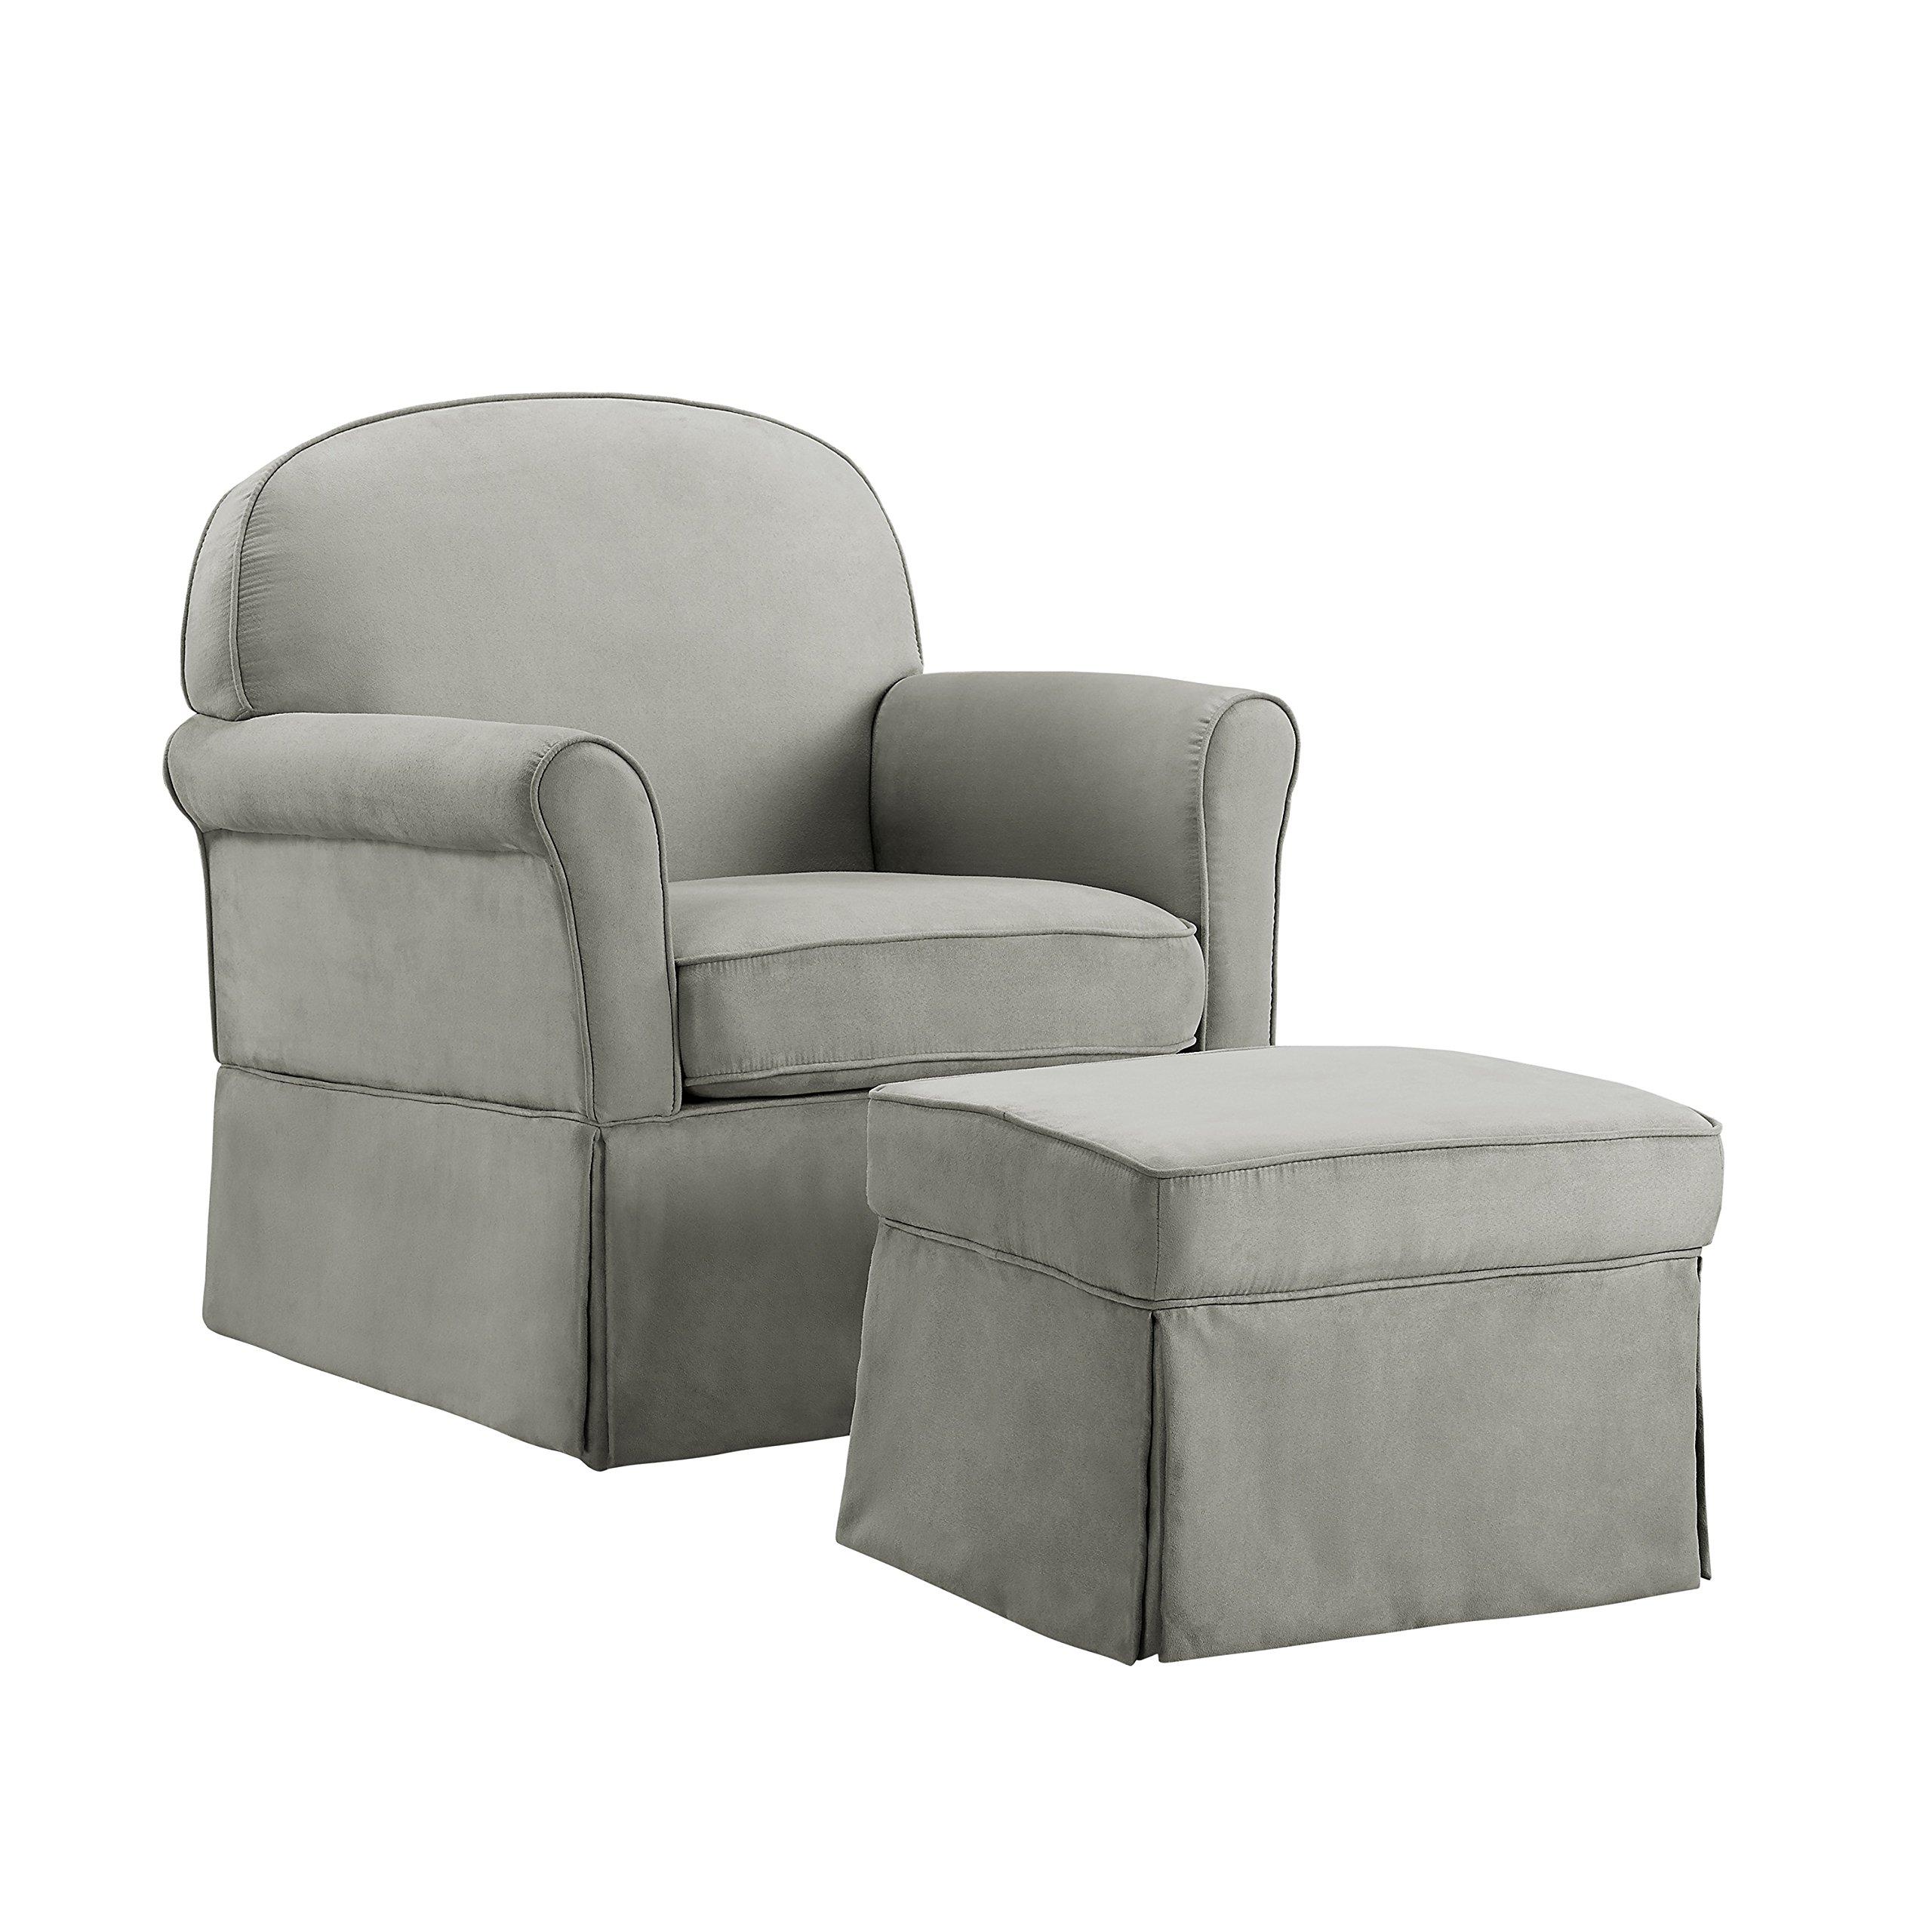 Avenue Greene Baby Relax Swivel Glider and Ottoman Set Grey